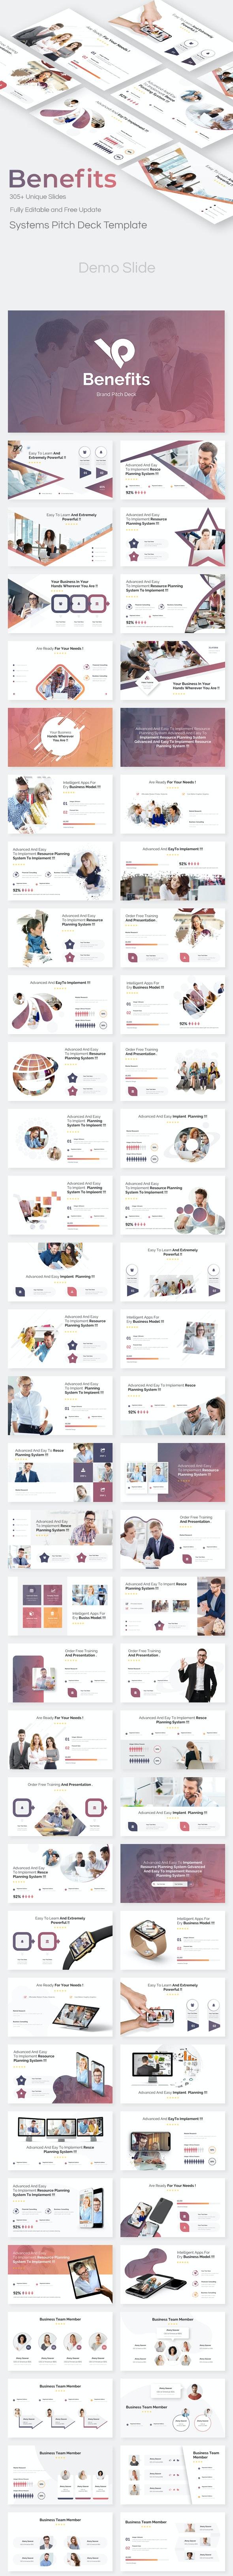 Brand Benefits Pitch Deck Google Slide Template - Google Slides Presentation Templates